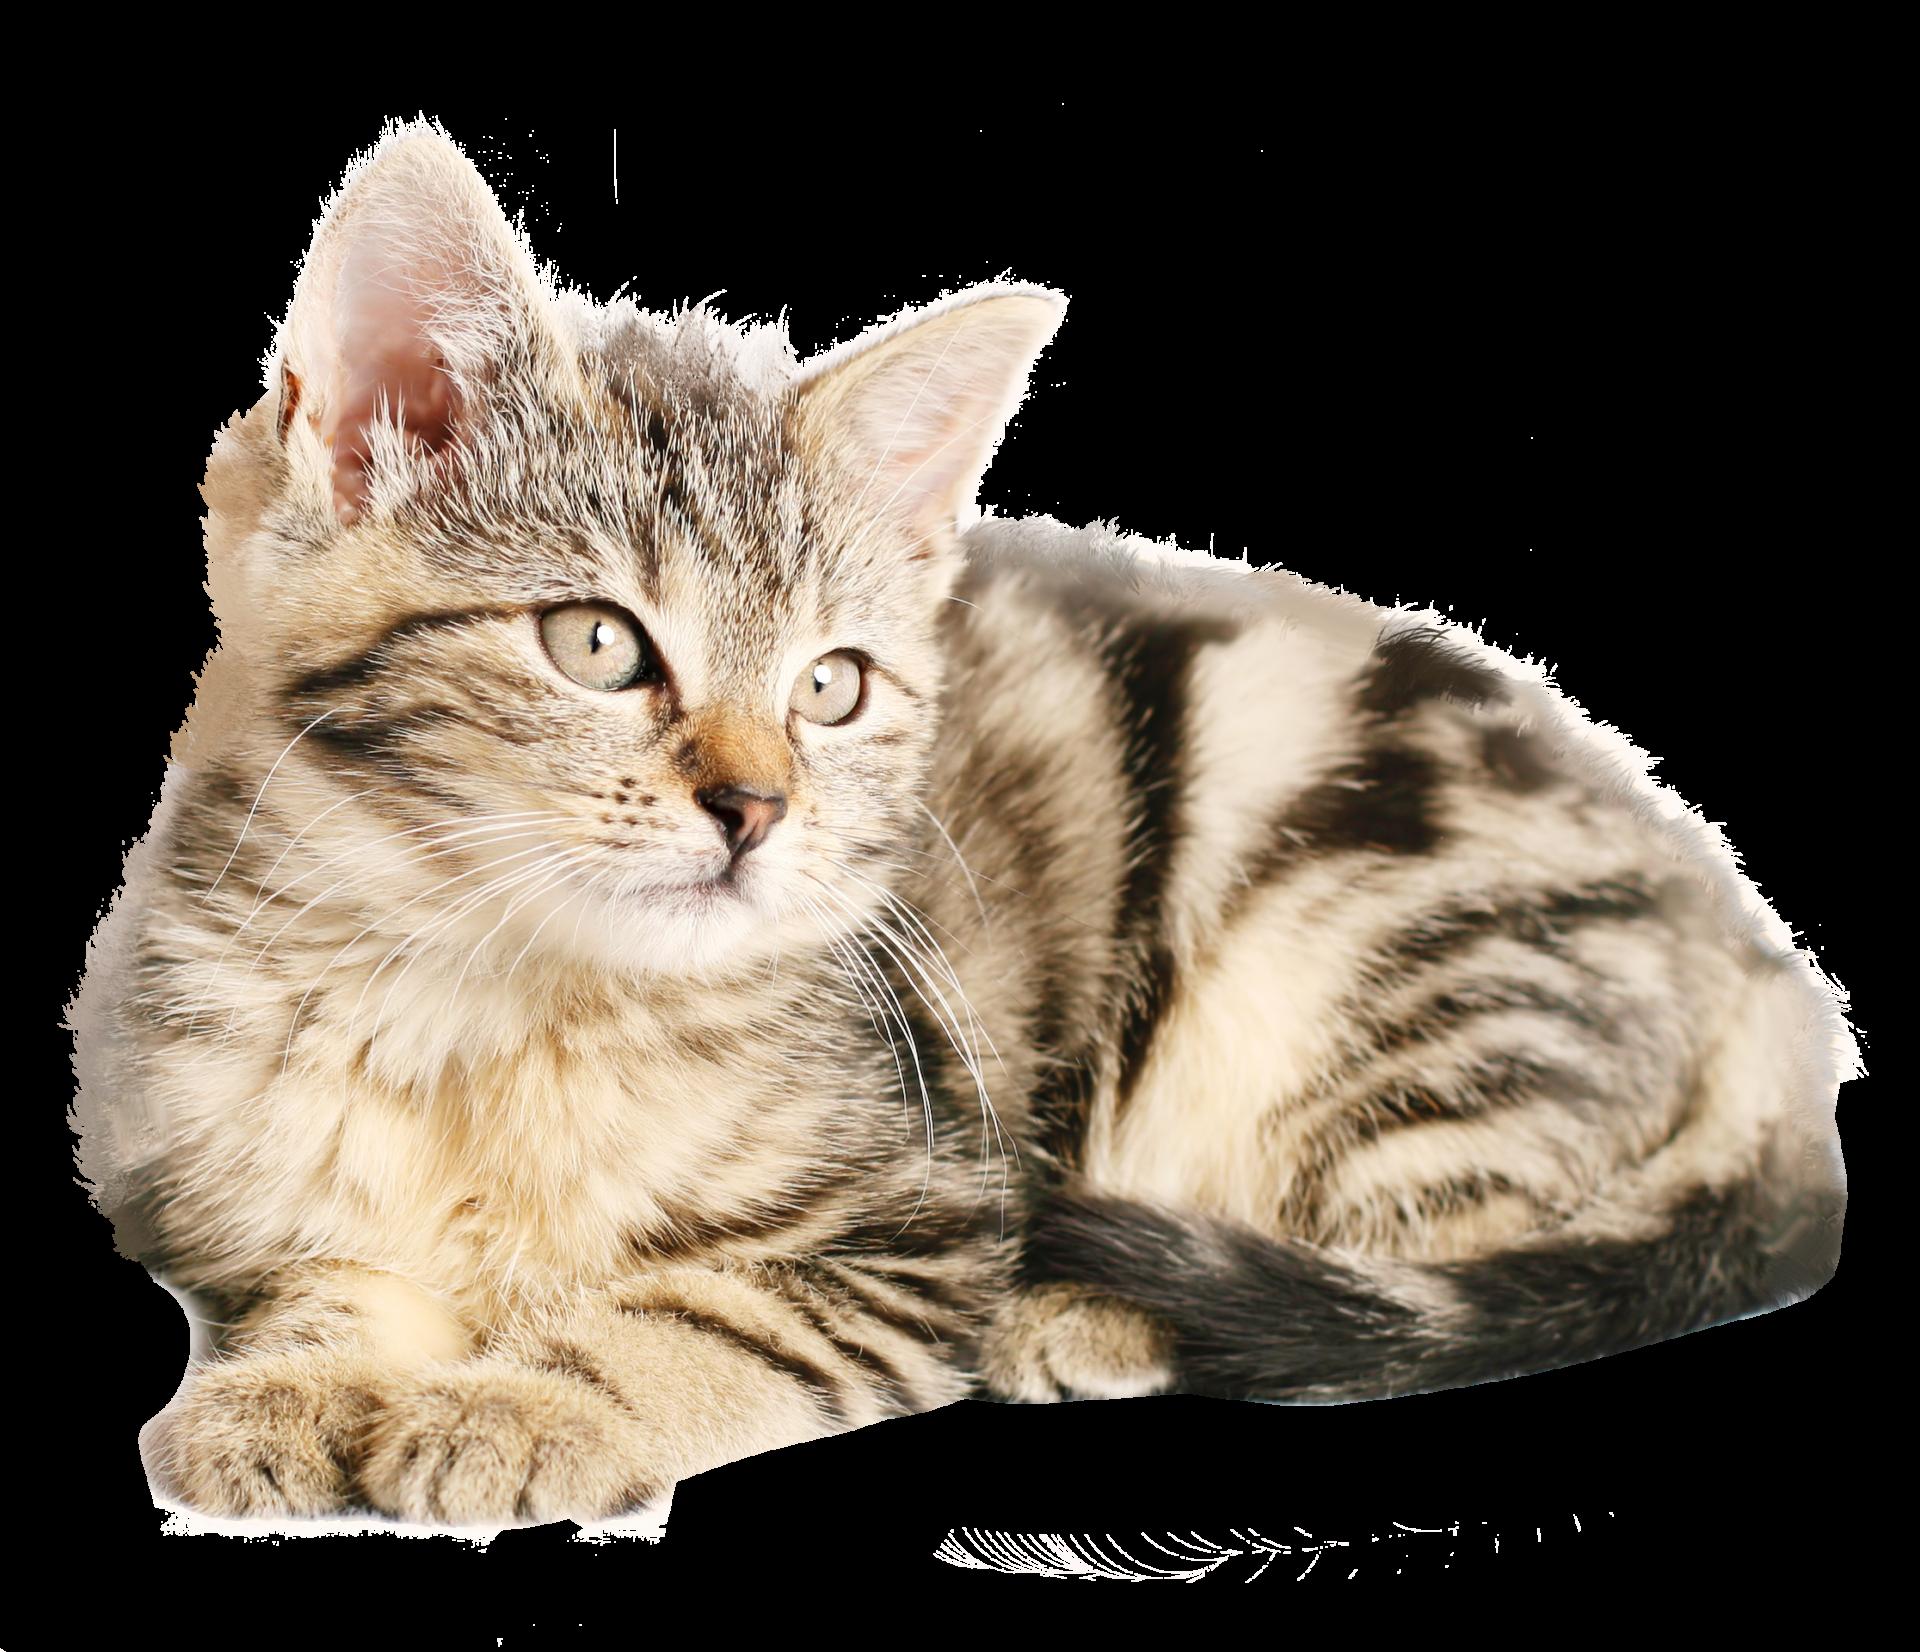 kisspng-tabby-cat-kitten-dog-popular-cat-names-cat-5a7525870c7e86.5601295415176267590512